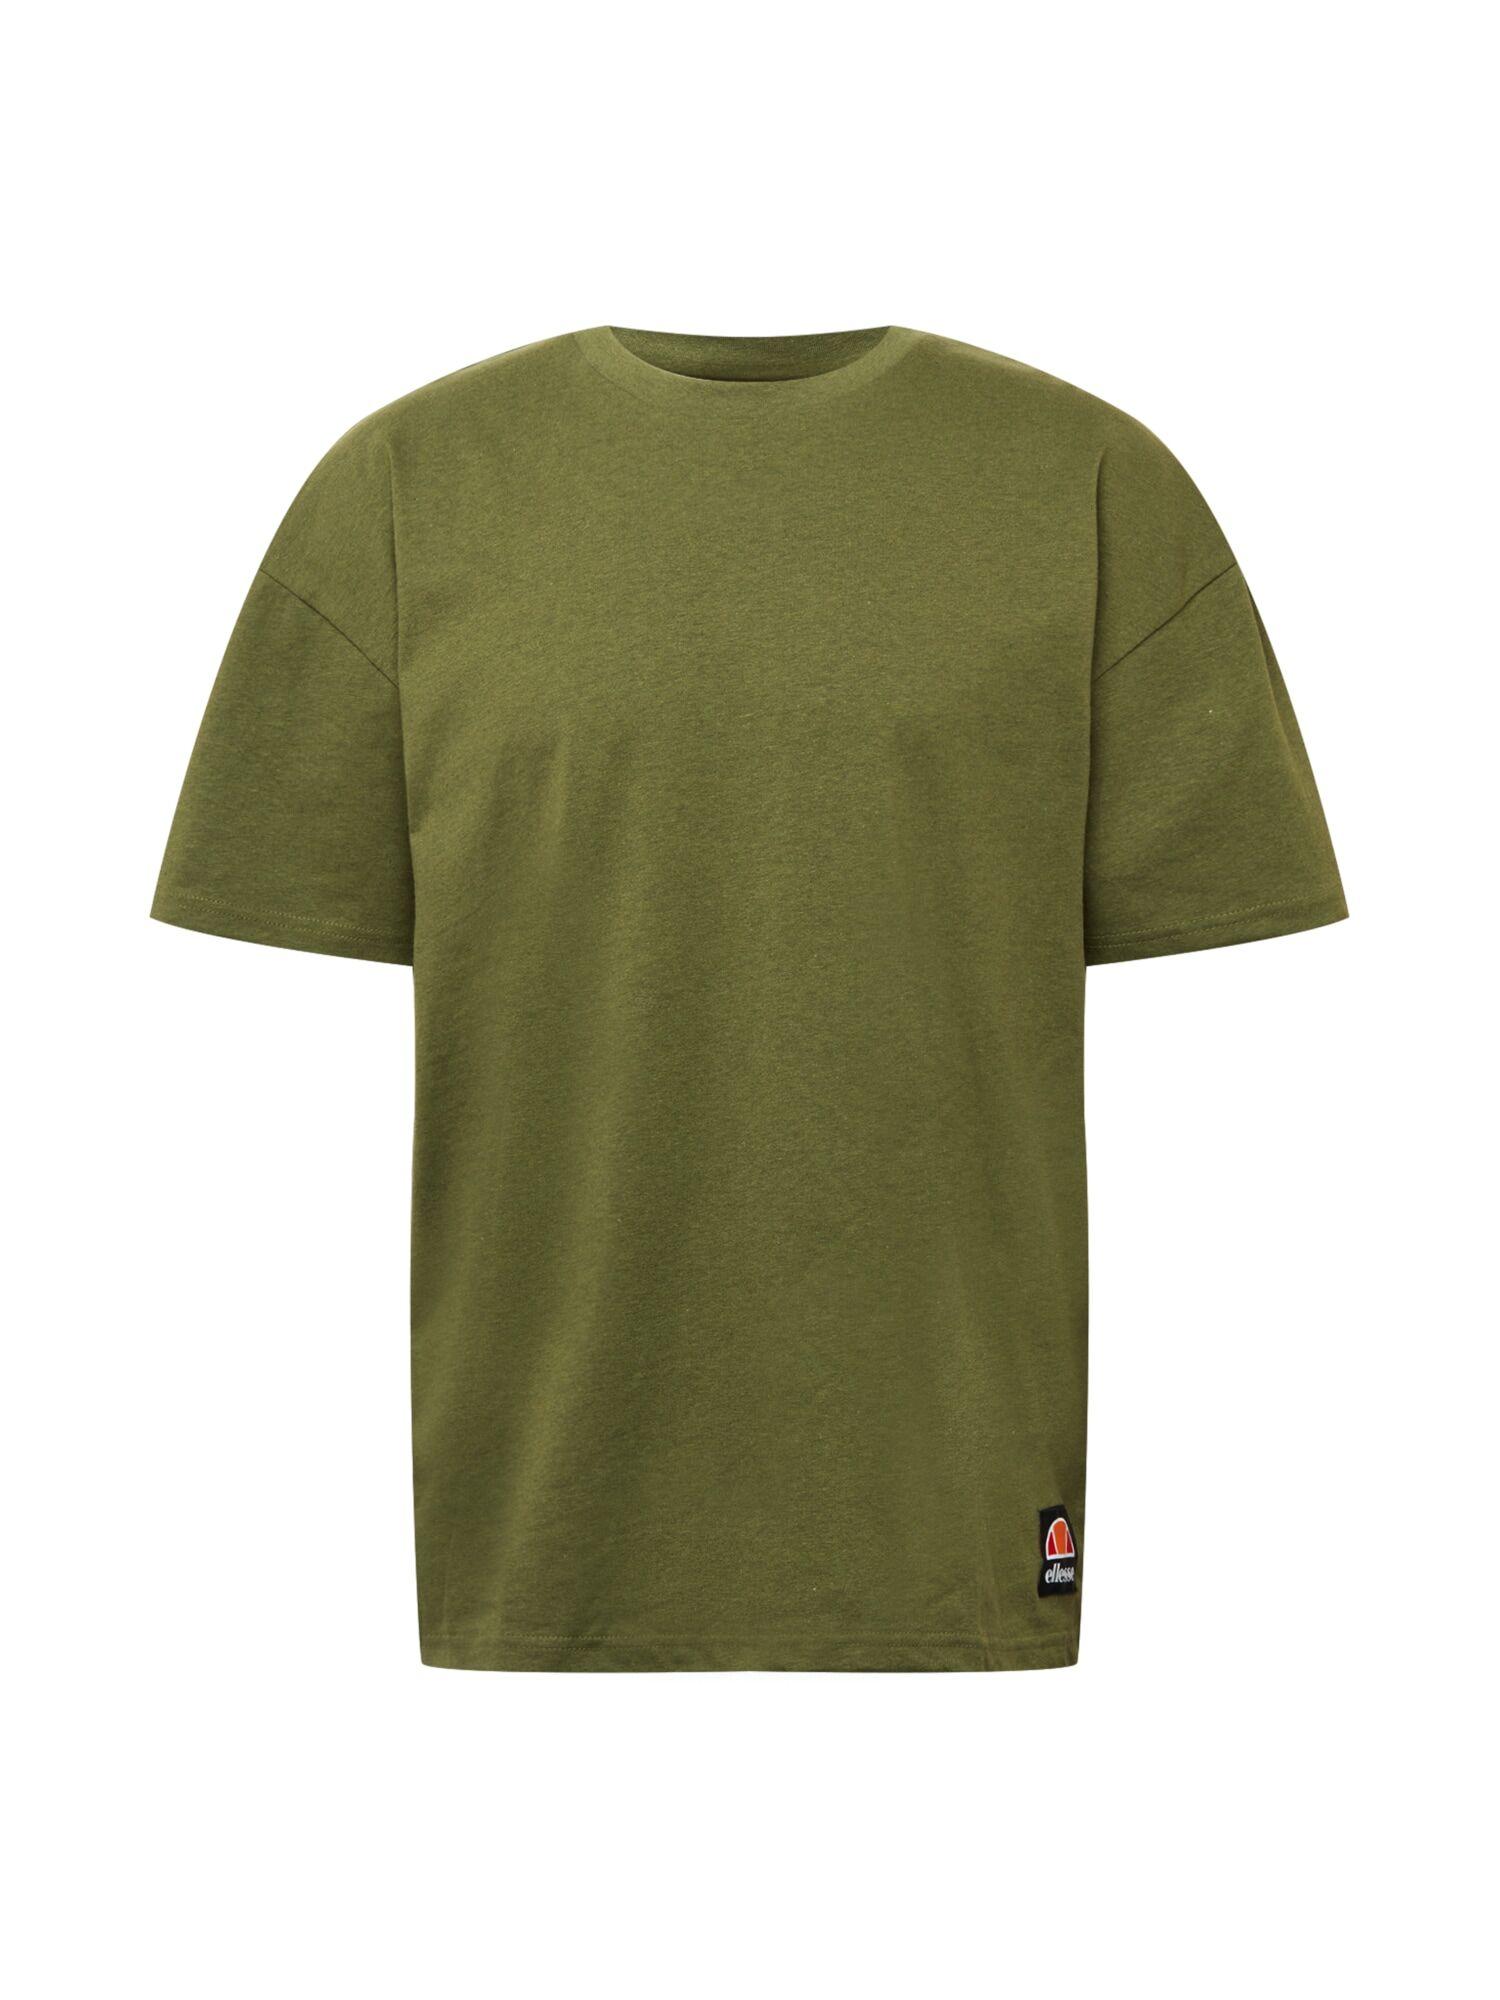 ELLESSE T-Shirt 'Avis'  - Vert - Taille: XL - male